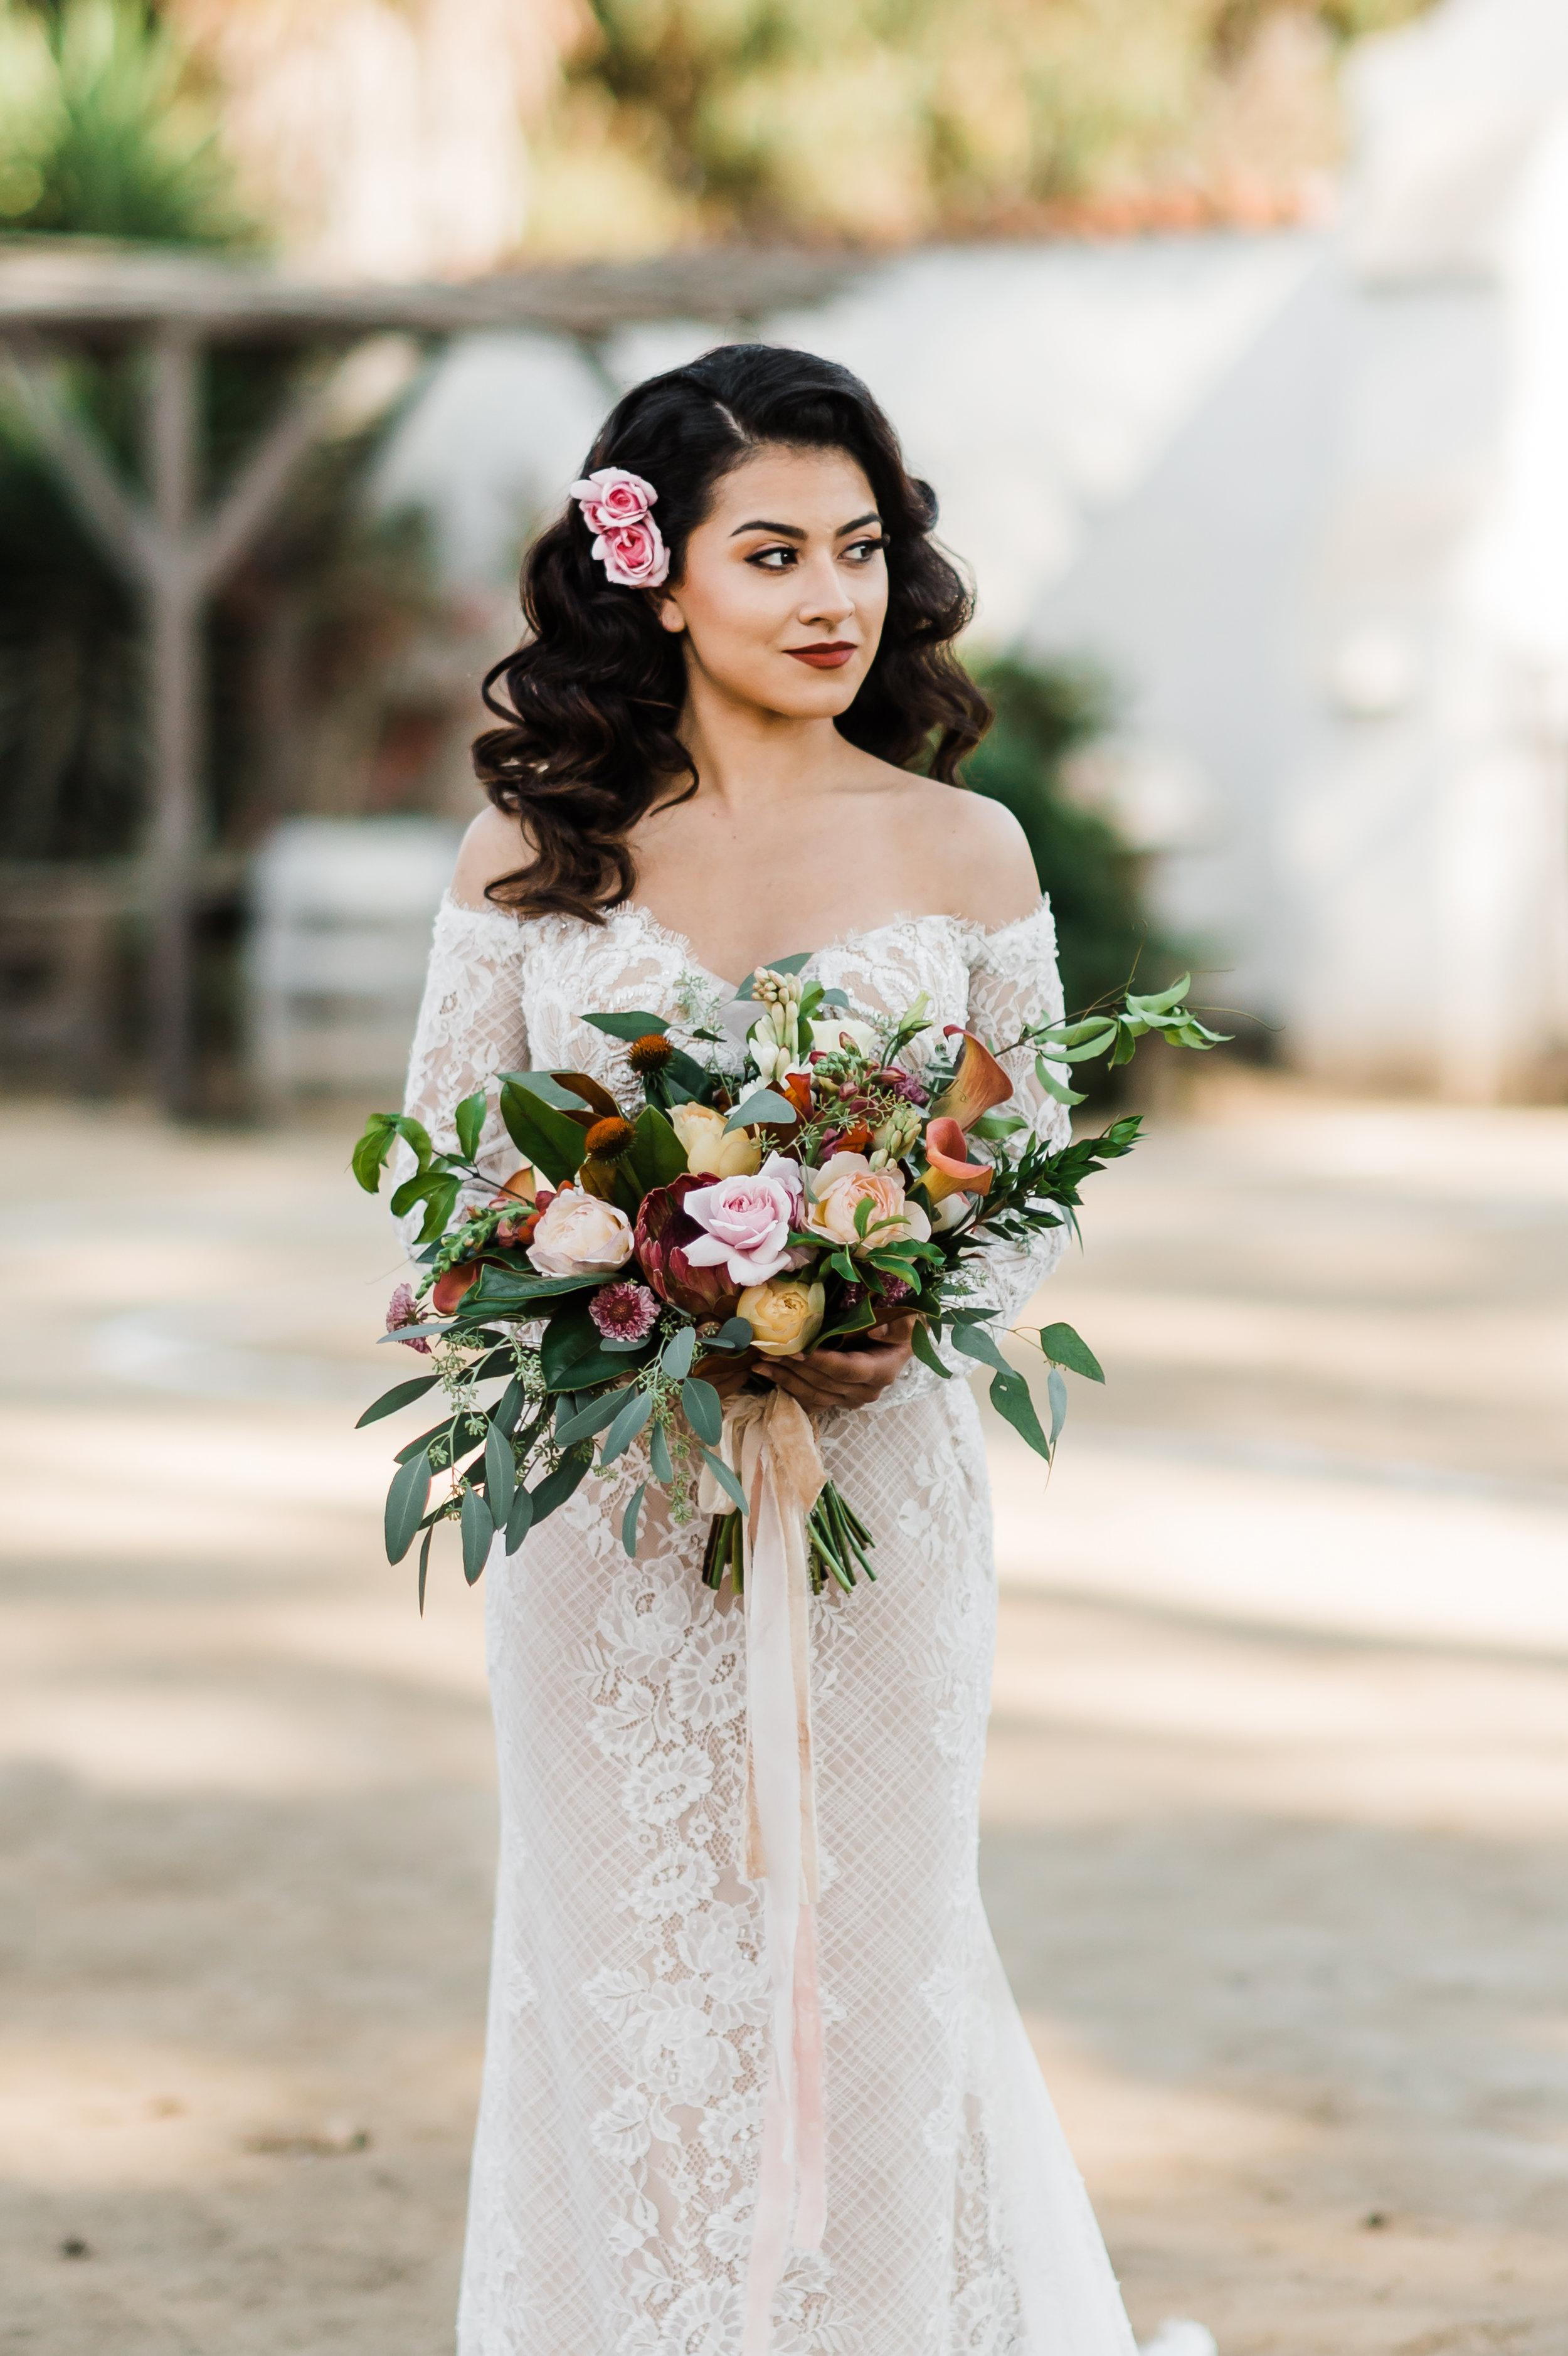 www.santabarbarawedding.com | Michelle Ramirez Photography | Olivas Adobe | Karen Marie Events | Tangled Lotus | Panache Bridal | Brenda Hendricks Artistry | Bride with Her Bouquet